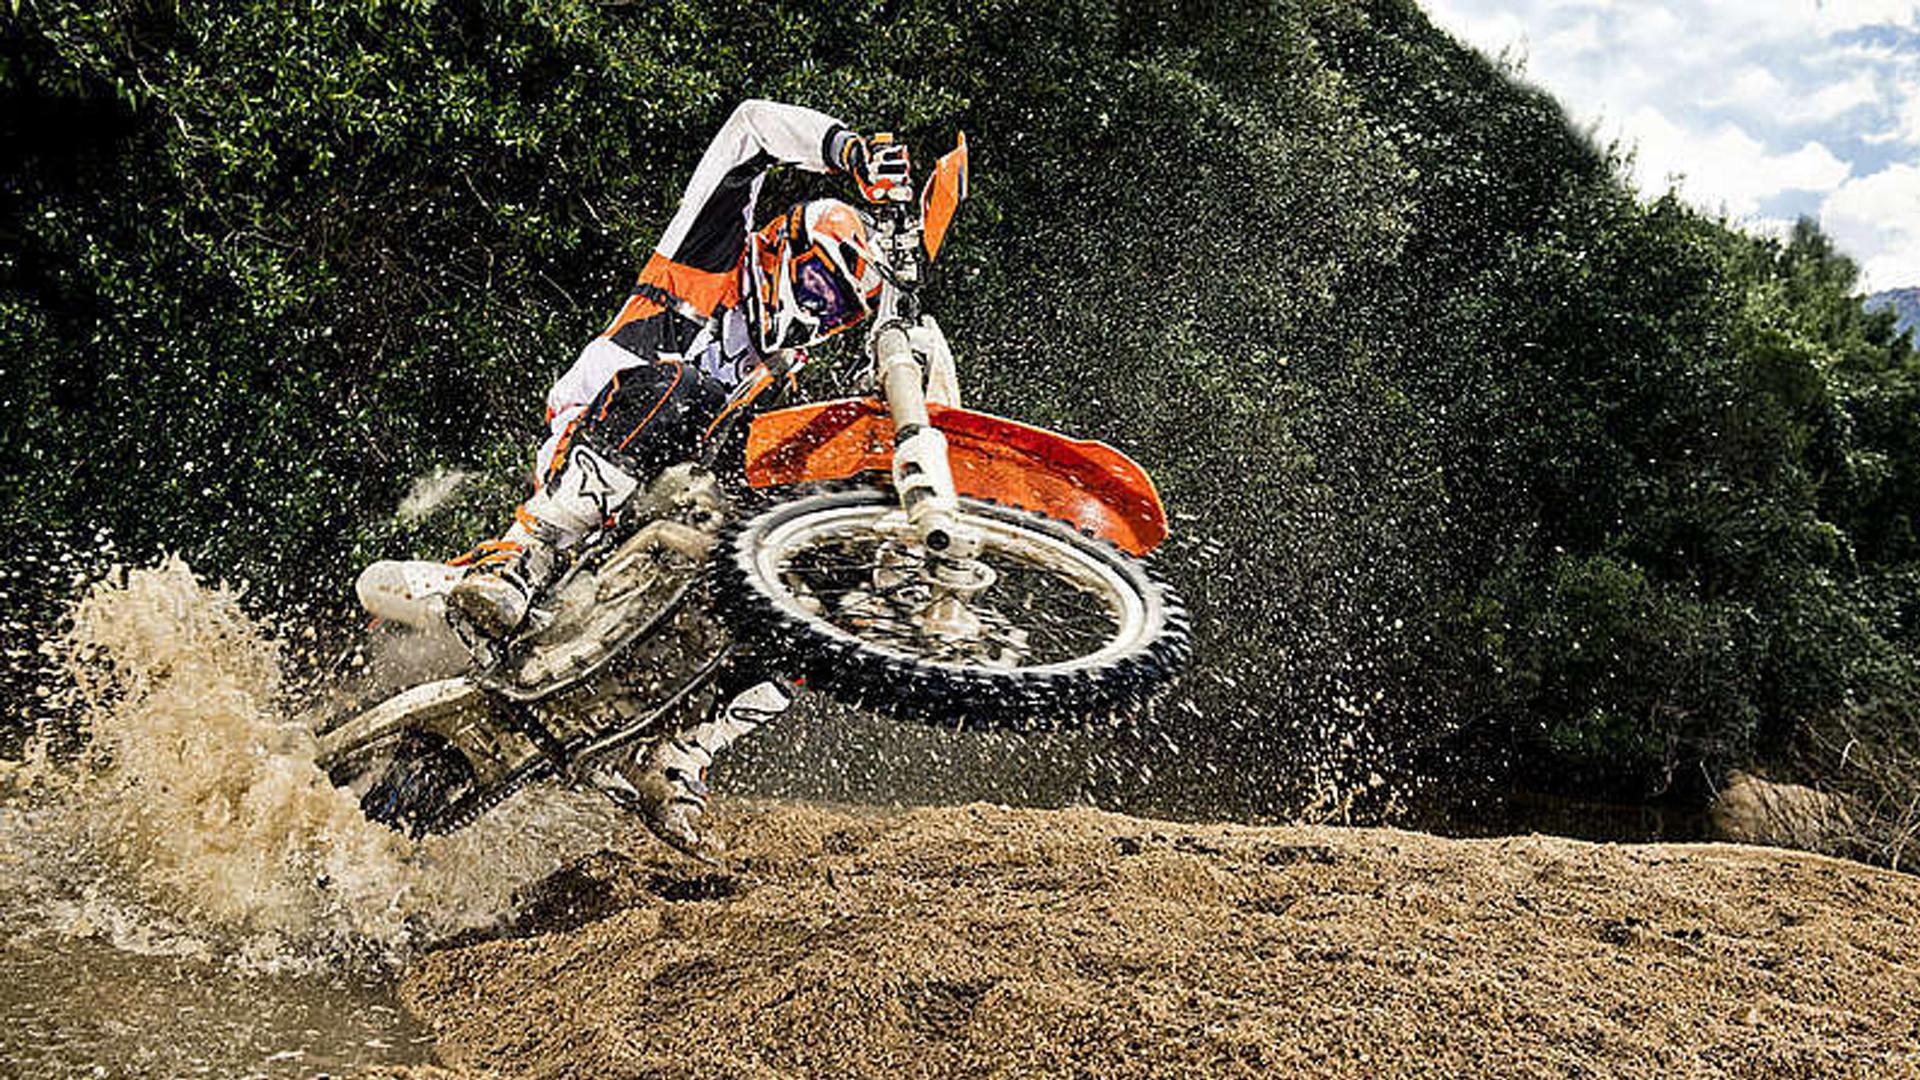 review 2014 KTM 350 EXC F 2014 KTM 350 EXC F Specs and wallpapers | 2014 KTM  350 EXC-F Wallpapers | Pinterest | Ktm exc and Dirt biking